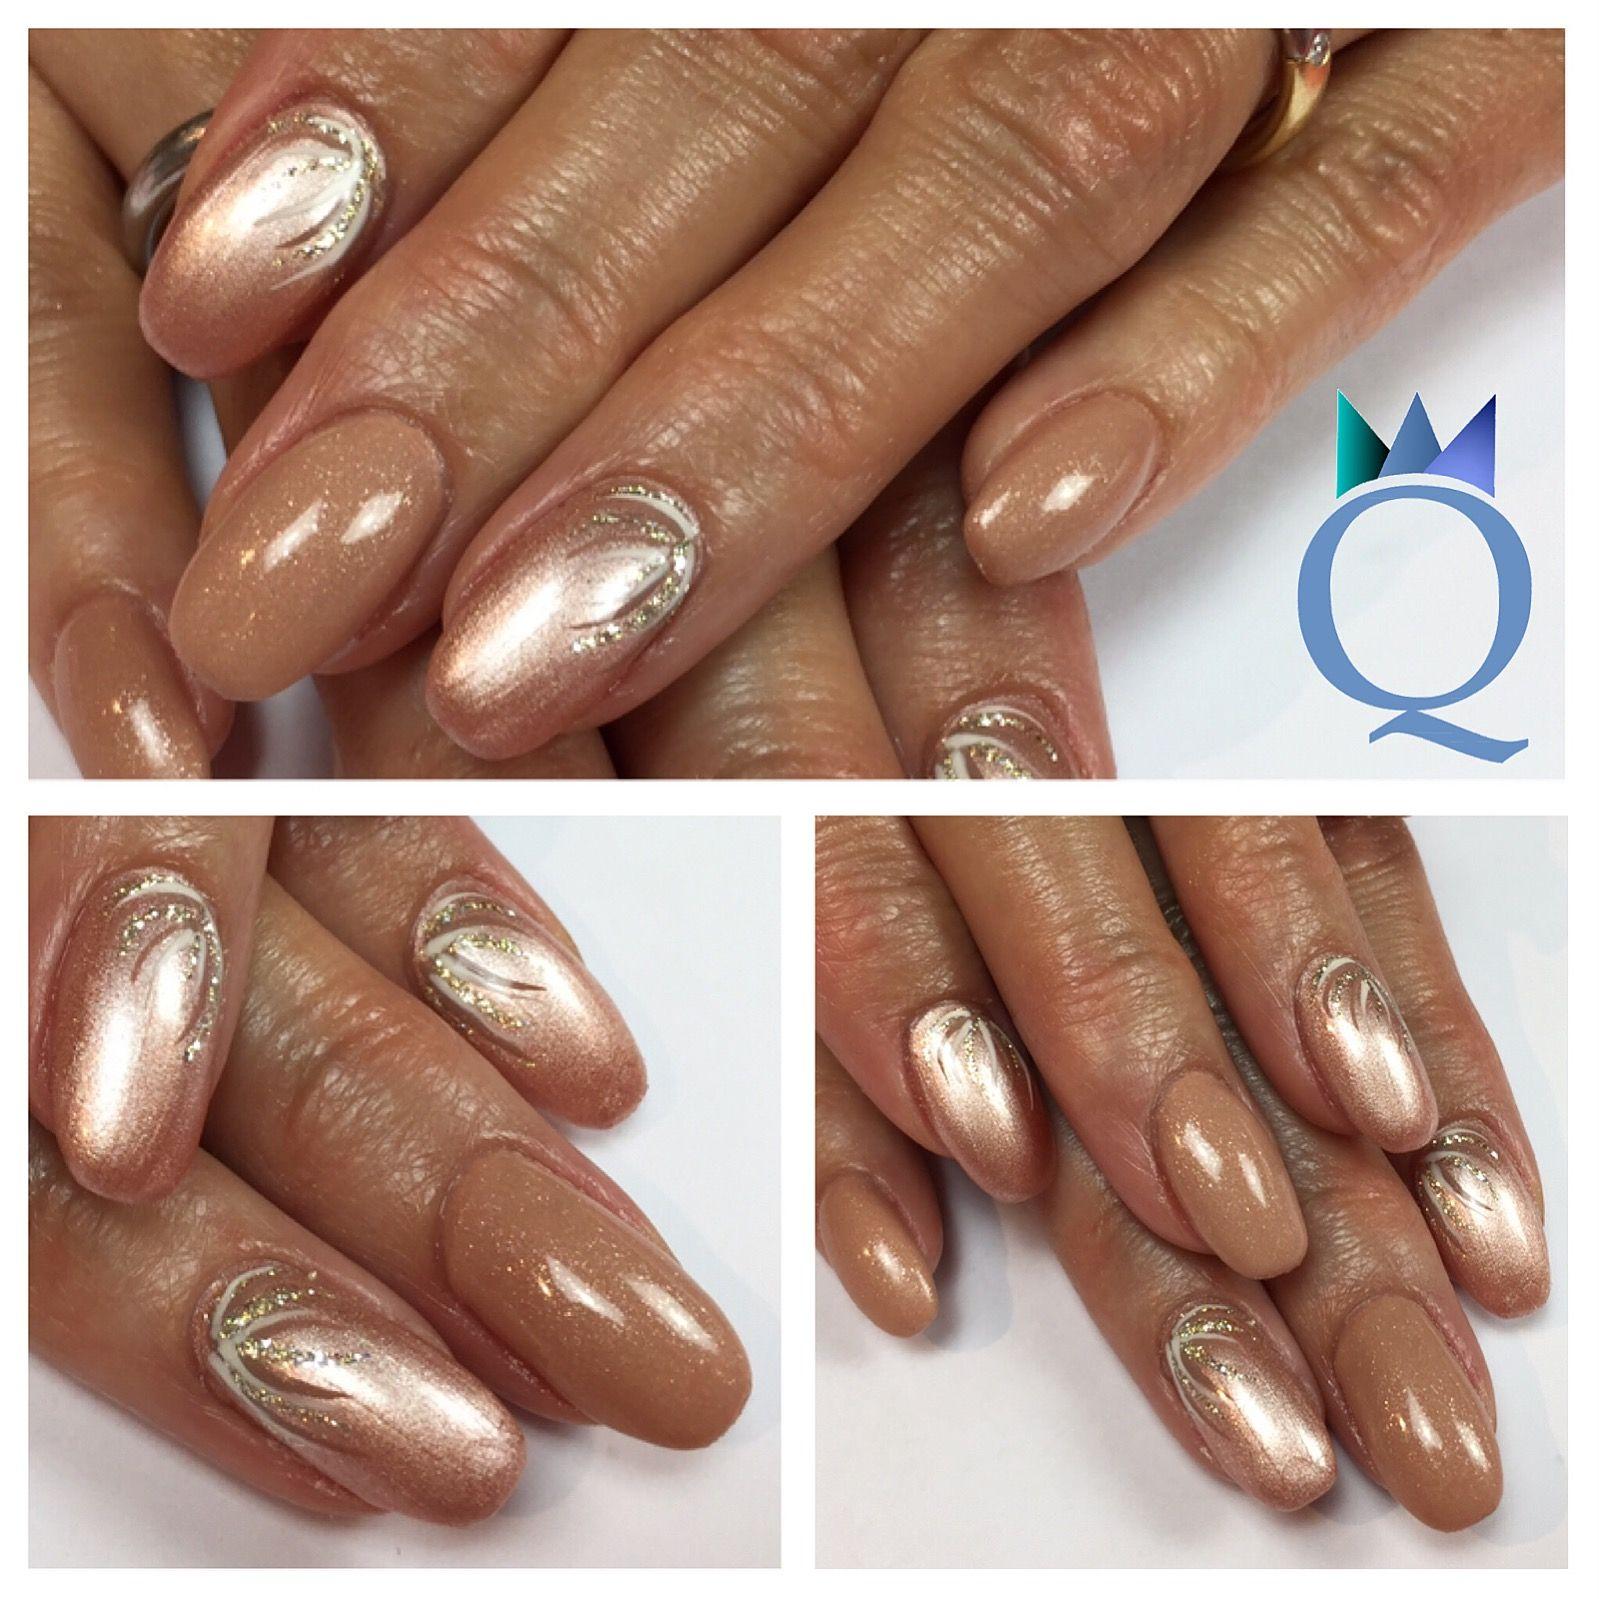 gelnails #nails #beige #glitter #handpainted #nailart #gelnägel ...